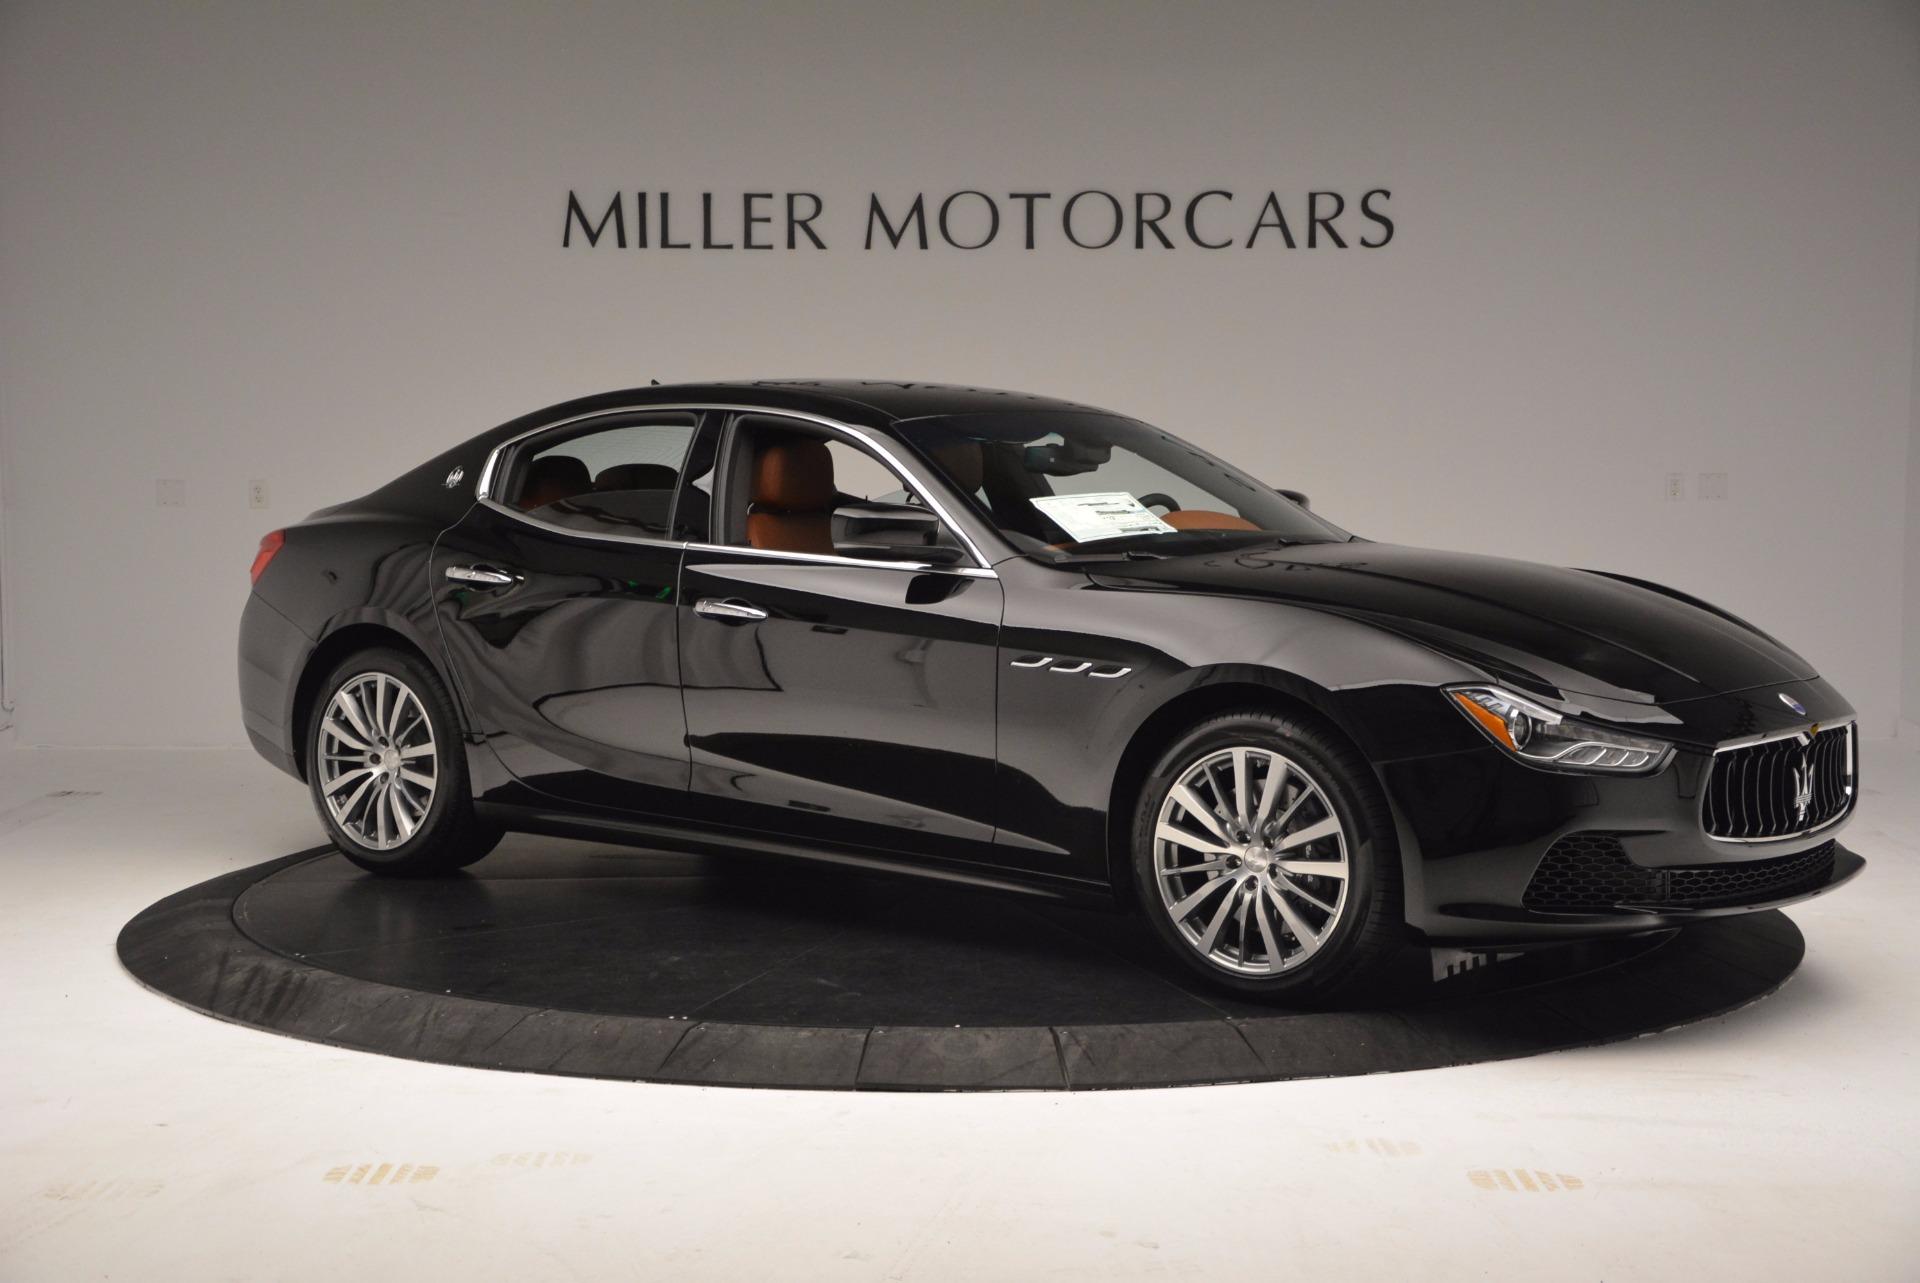 New 2017 Maserati Ghibli S Q4 EX-LOANER For Sale In Greenwich, CT 1115_p10